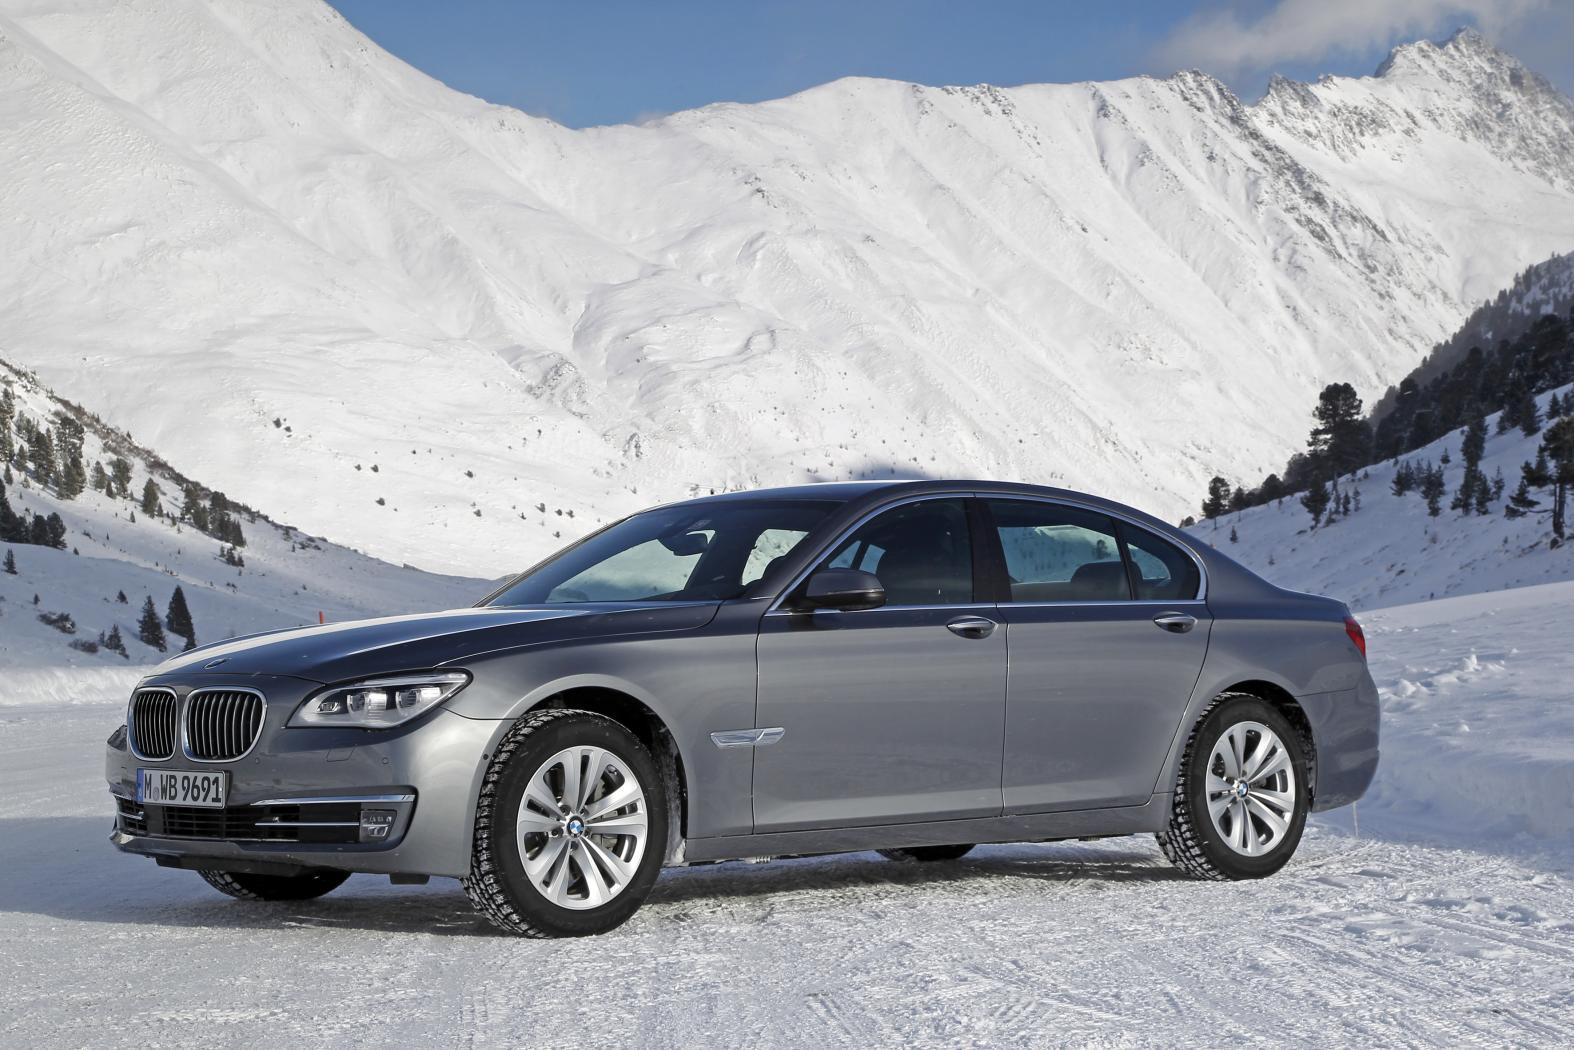 BMW-Serie-7-F01-8.jpeg